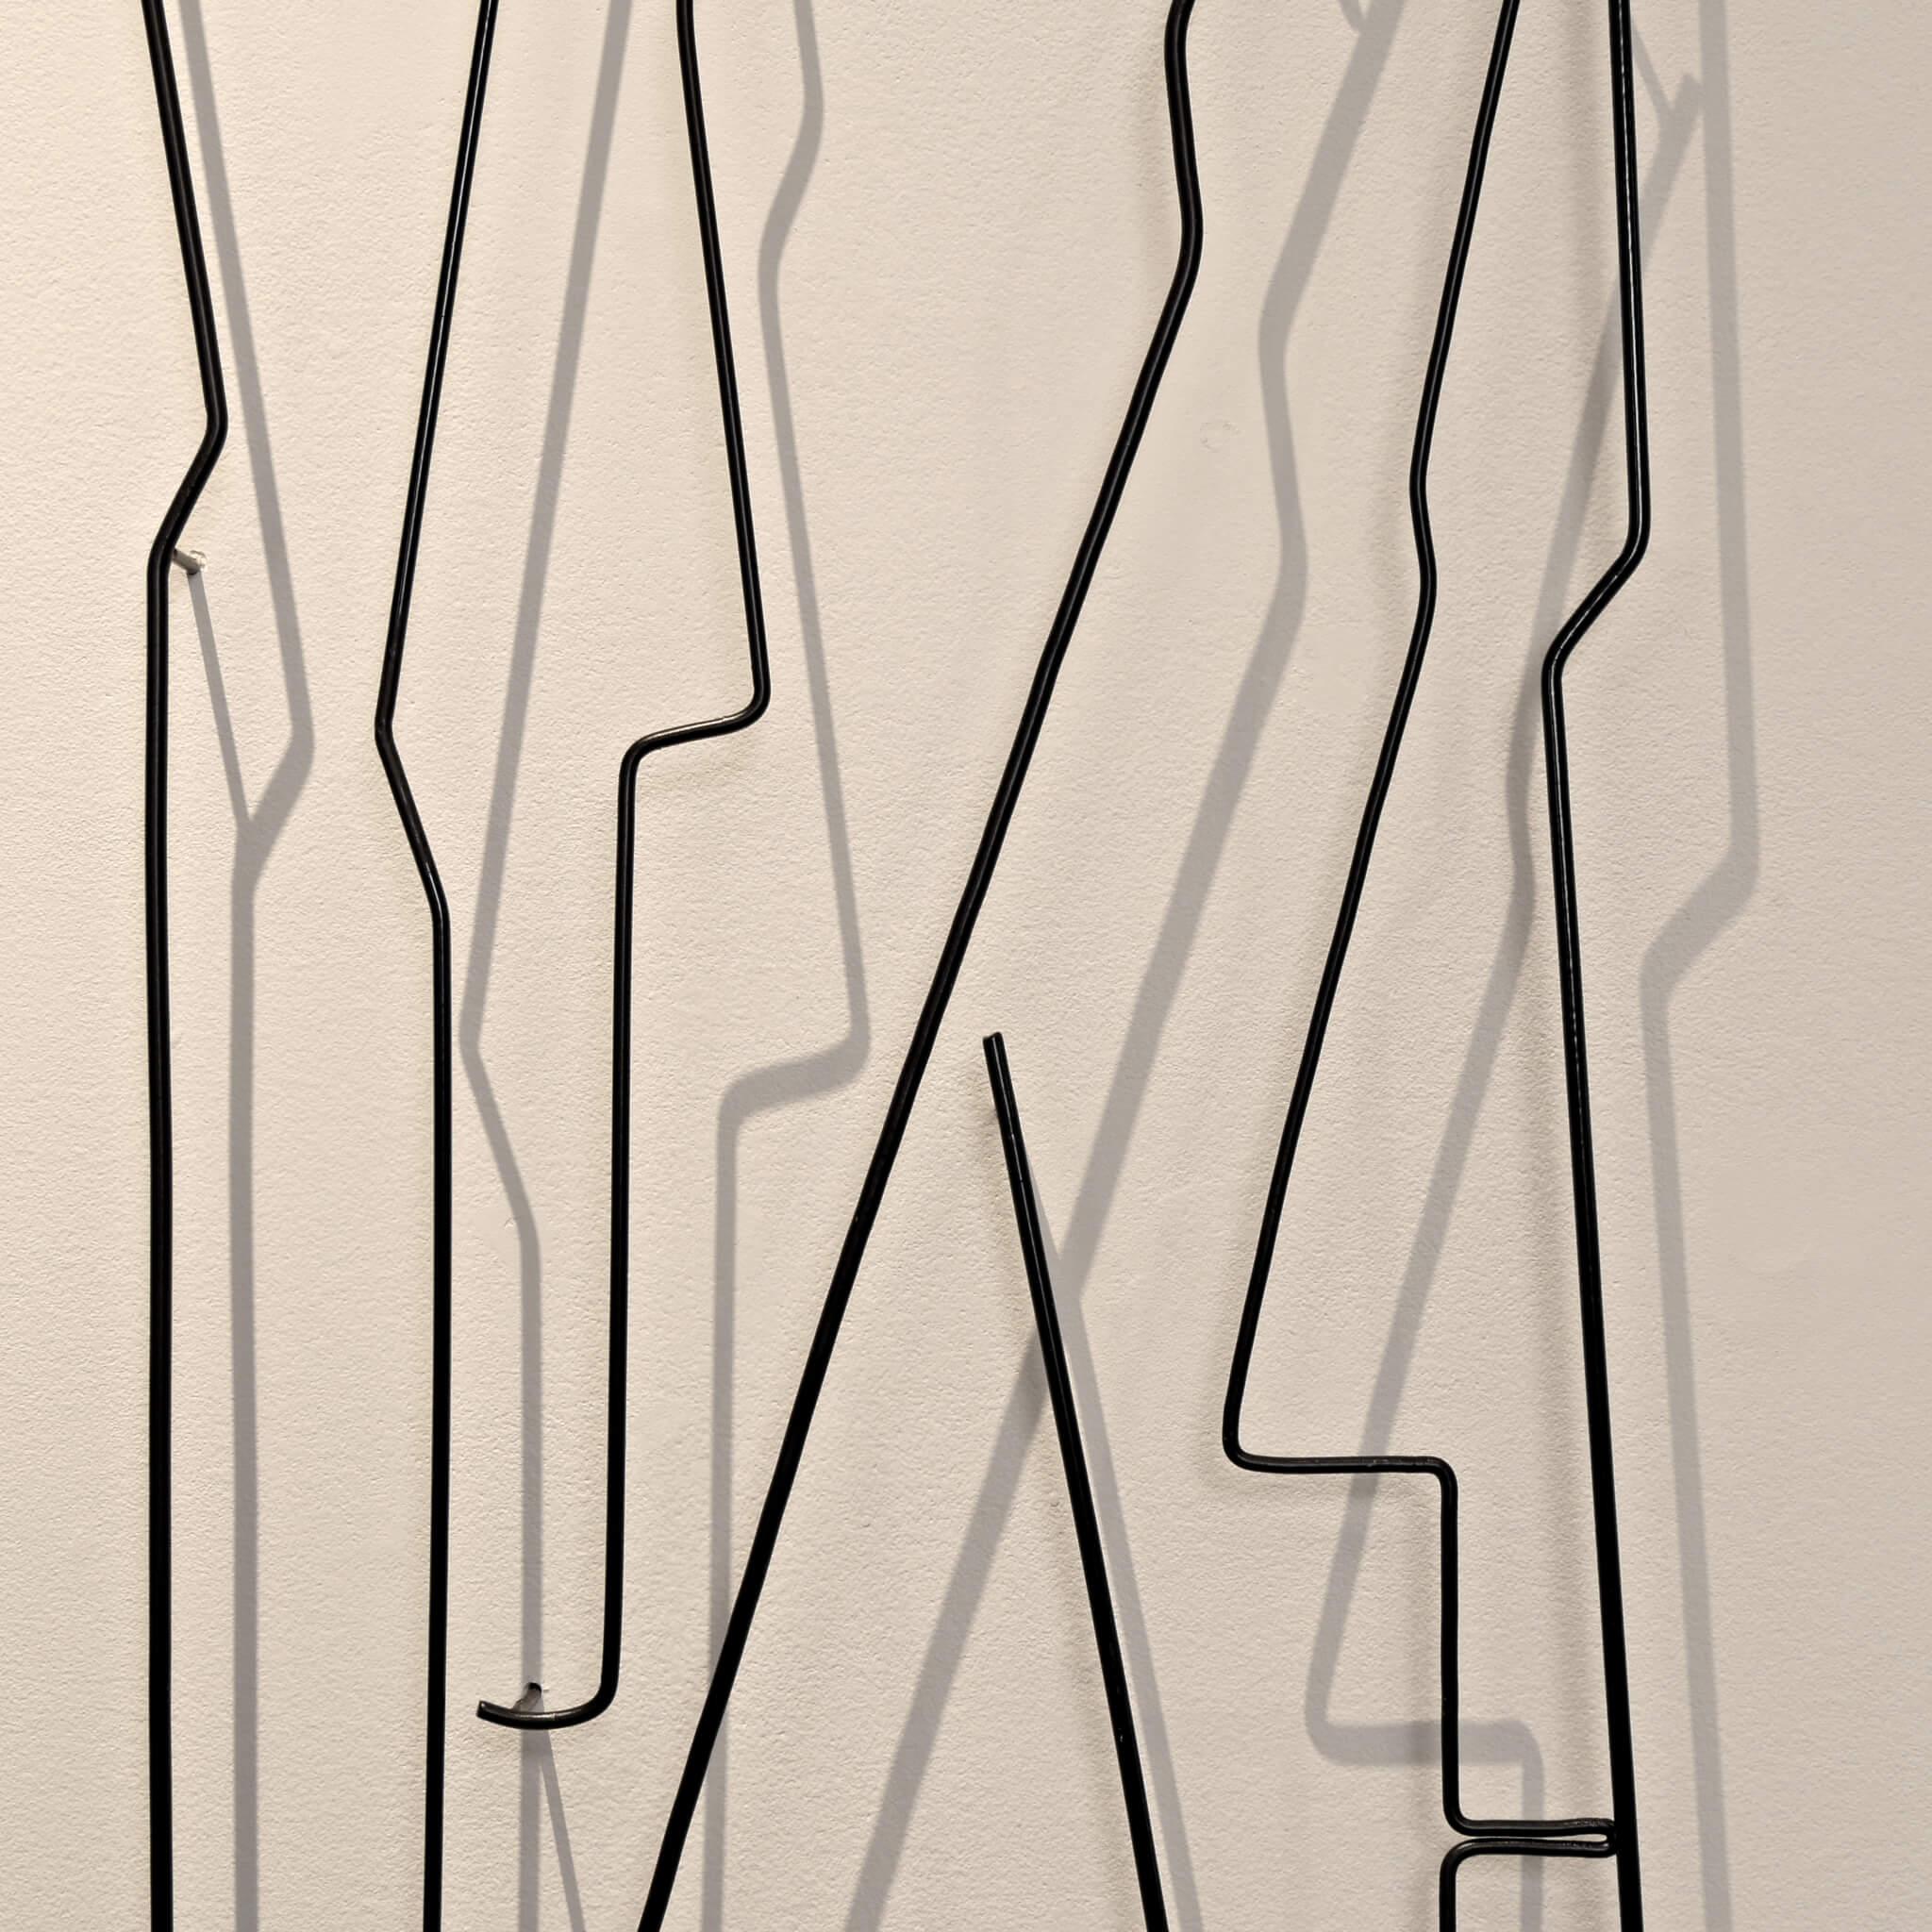 Pamela Merory Durnham, Vertical Landscape #6, wire sculpture, detail